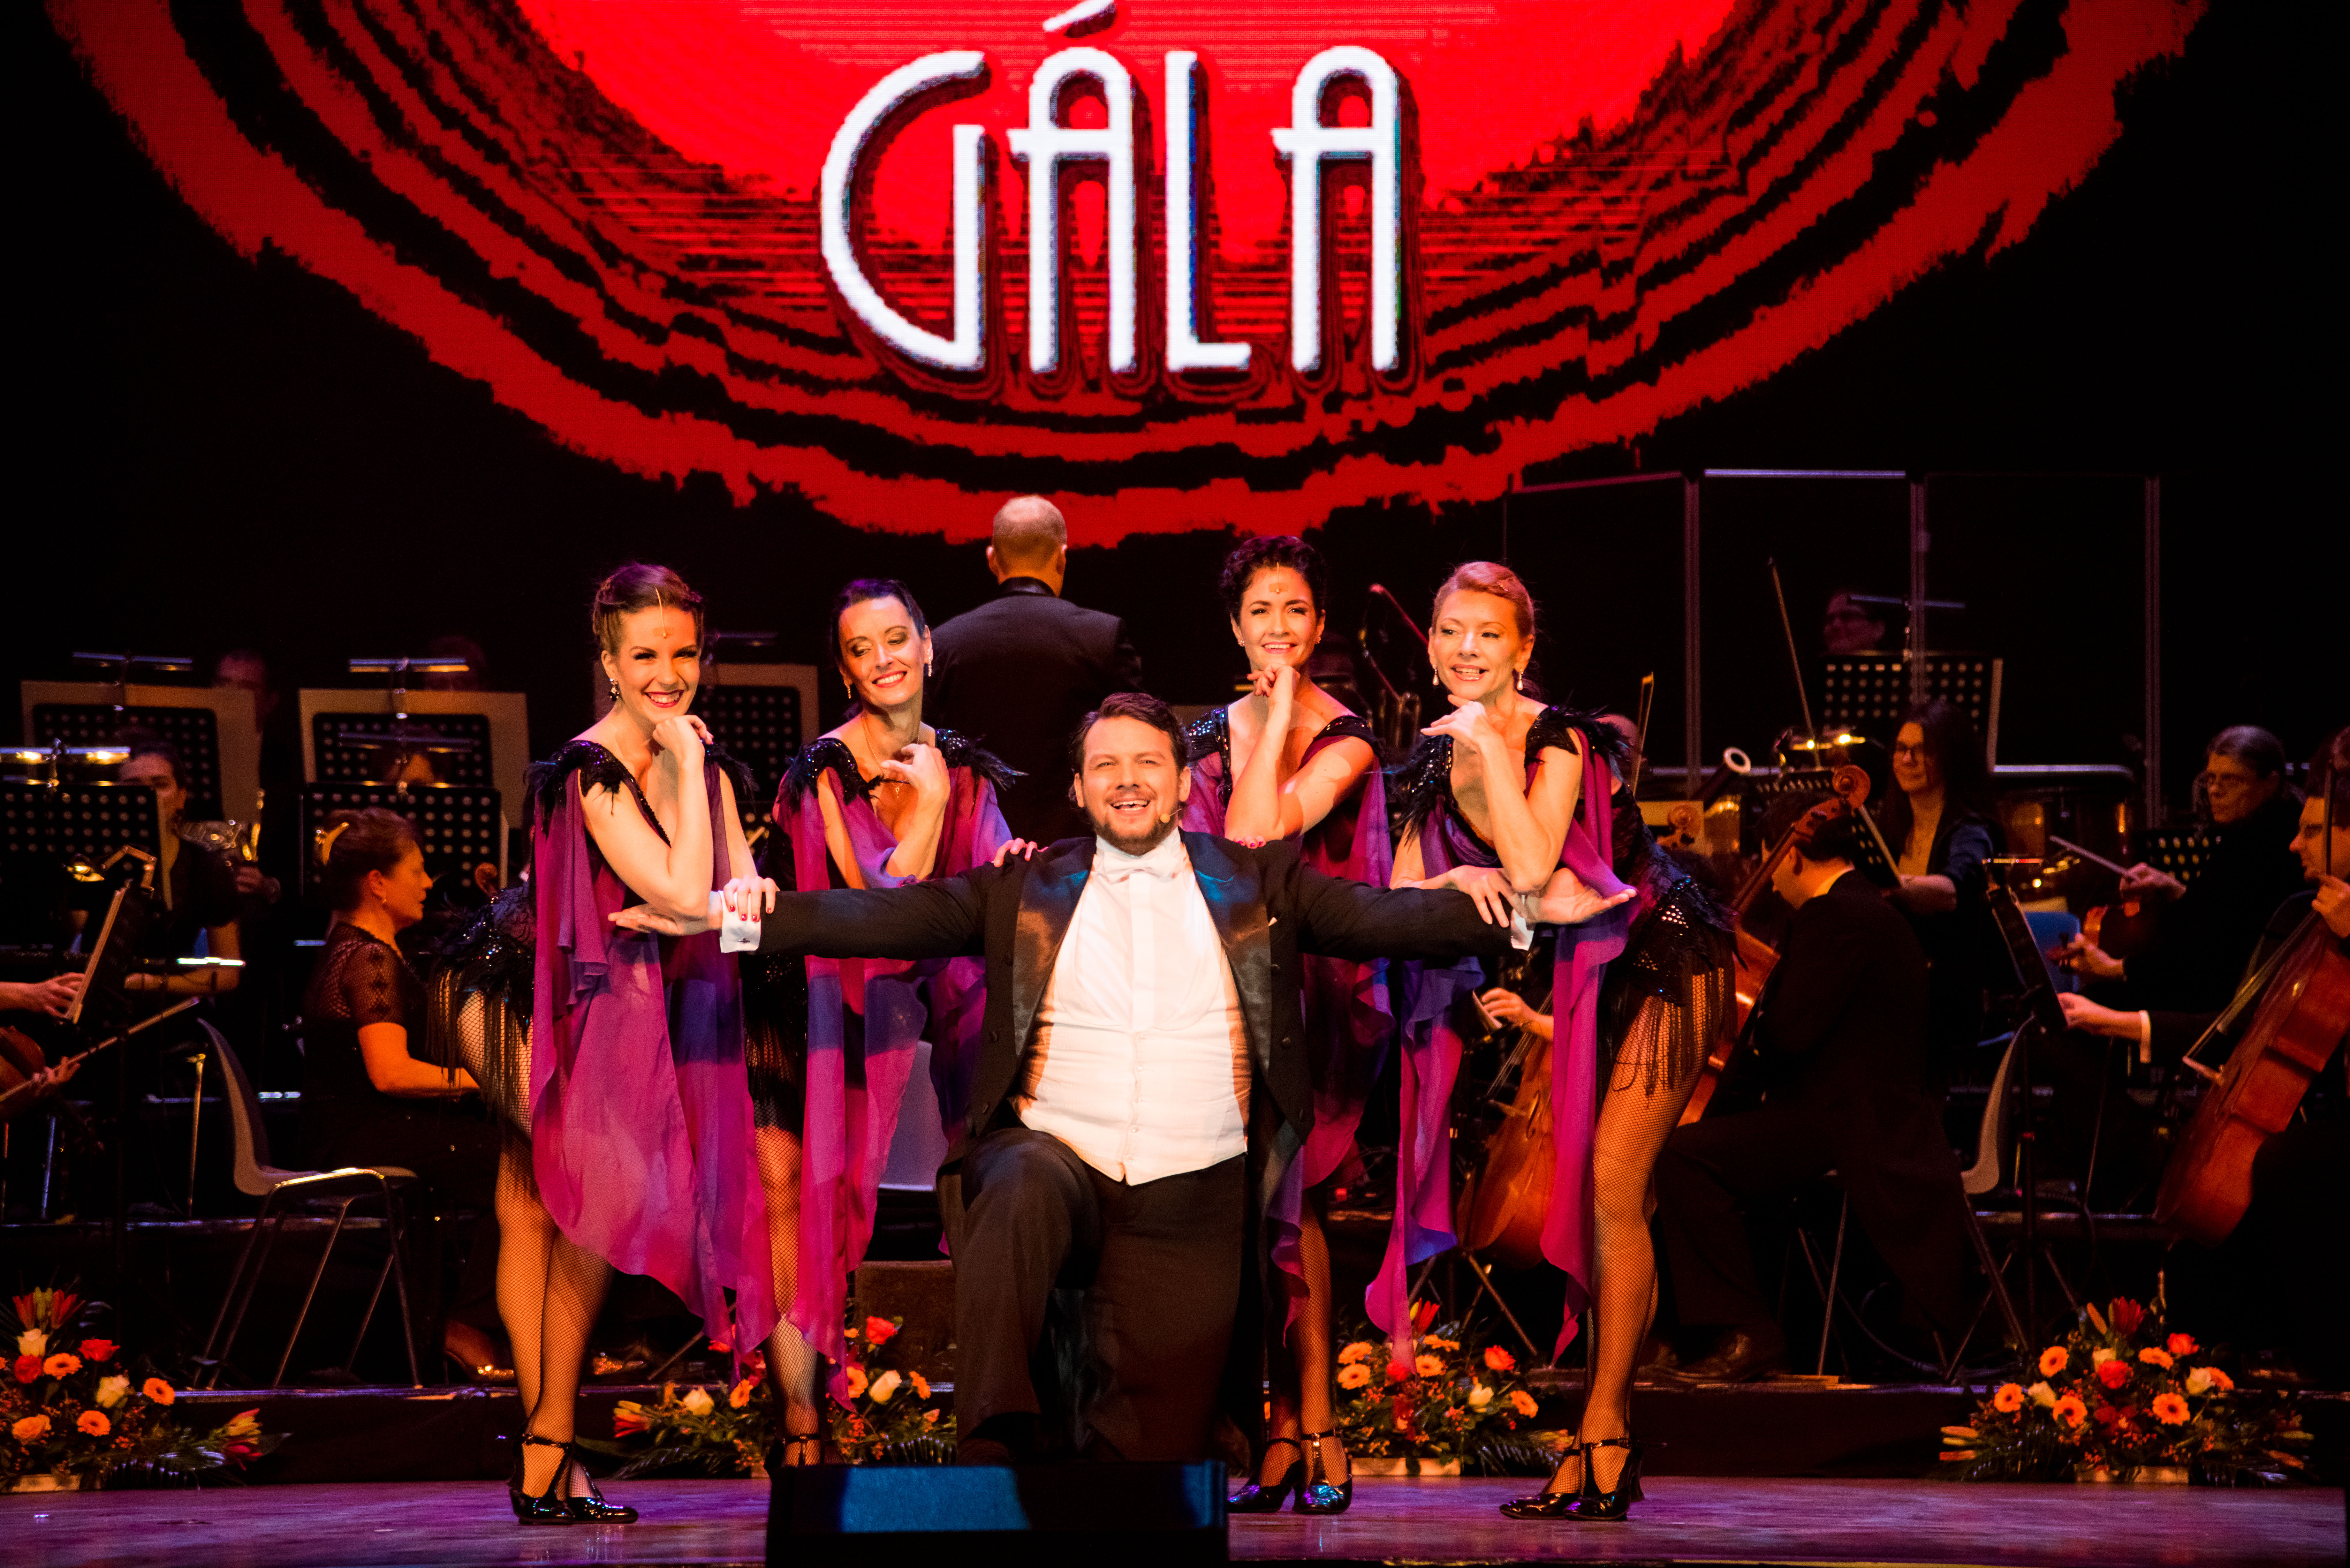 A Budapesti Operettszínház újévi gálaműsora